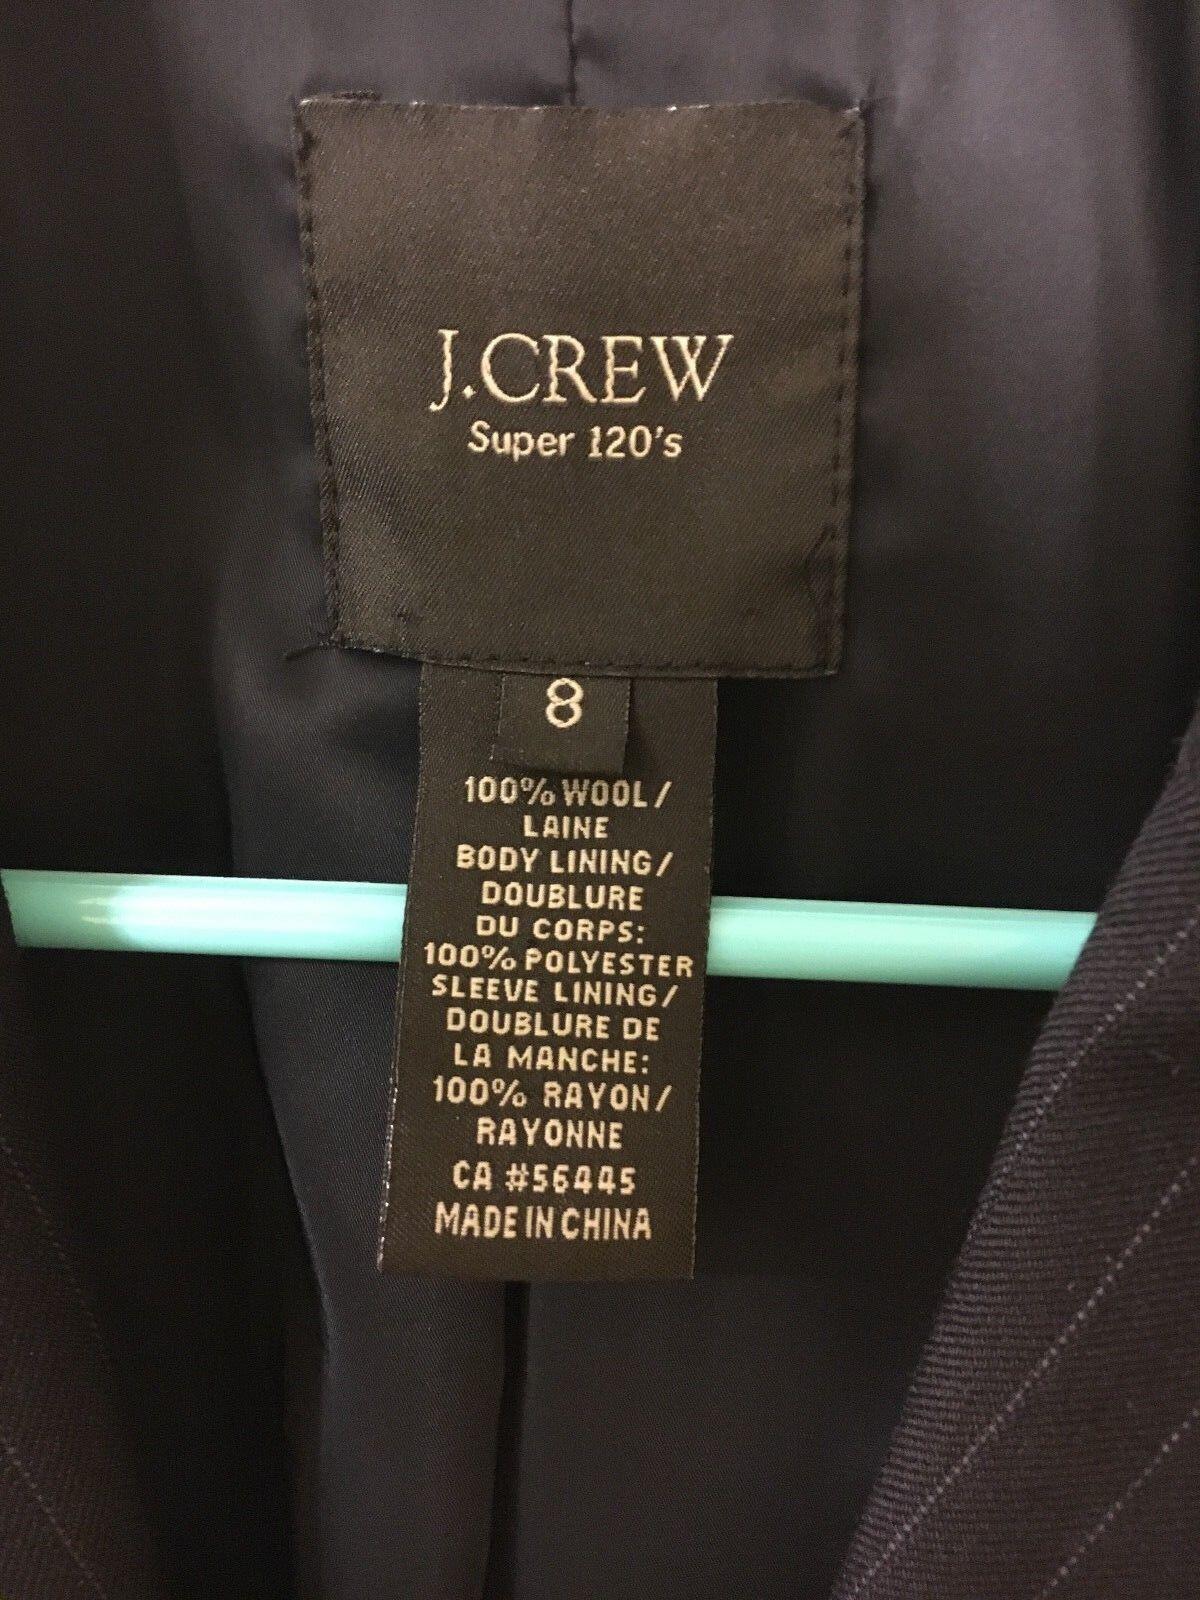 EUC J CREW SUPER 120'S 120'S 120'S WOOL BLAZER SZ 8 DARK NAVY PINSTRIPE 02624b